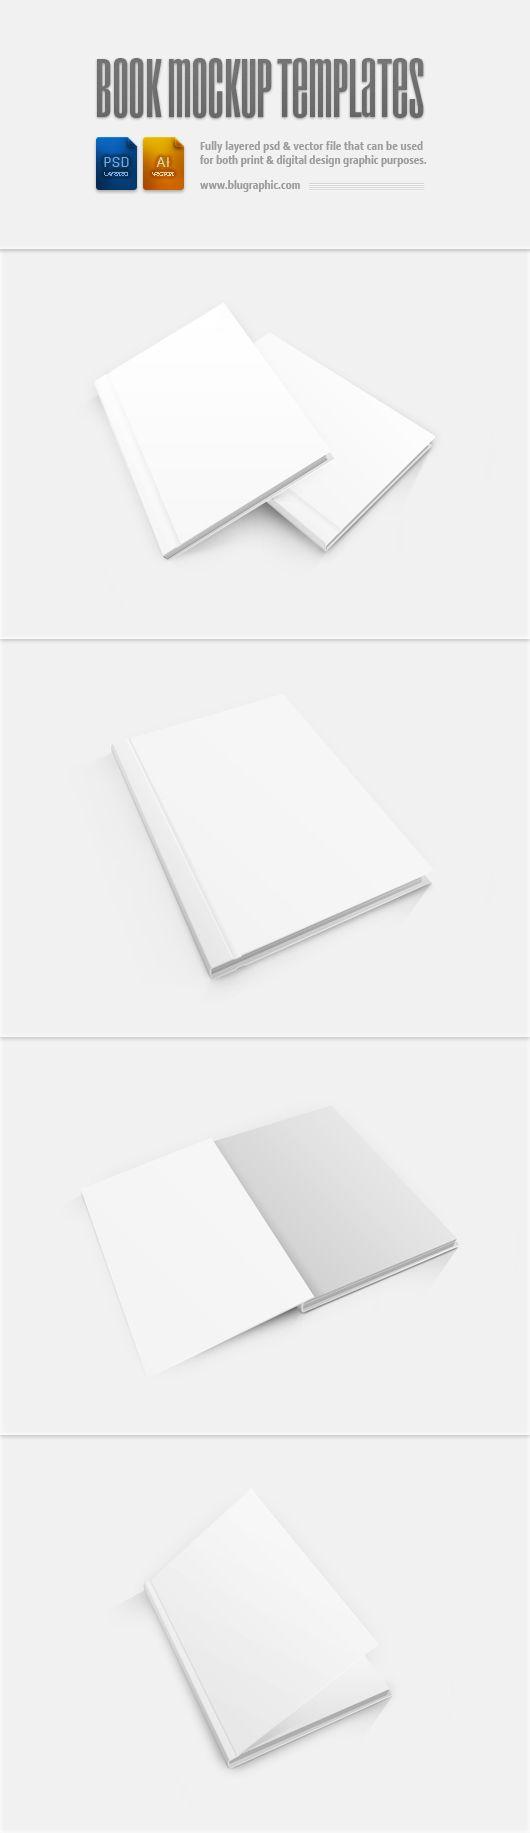 Get your design freebie -  Book Mockup Template #mockup #photoshop #vector #freebies